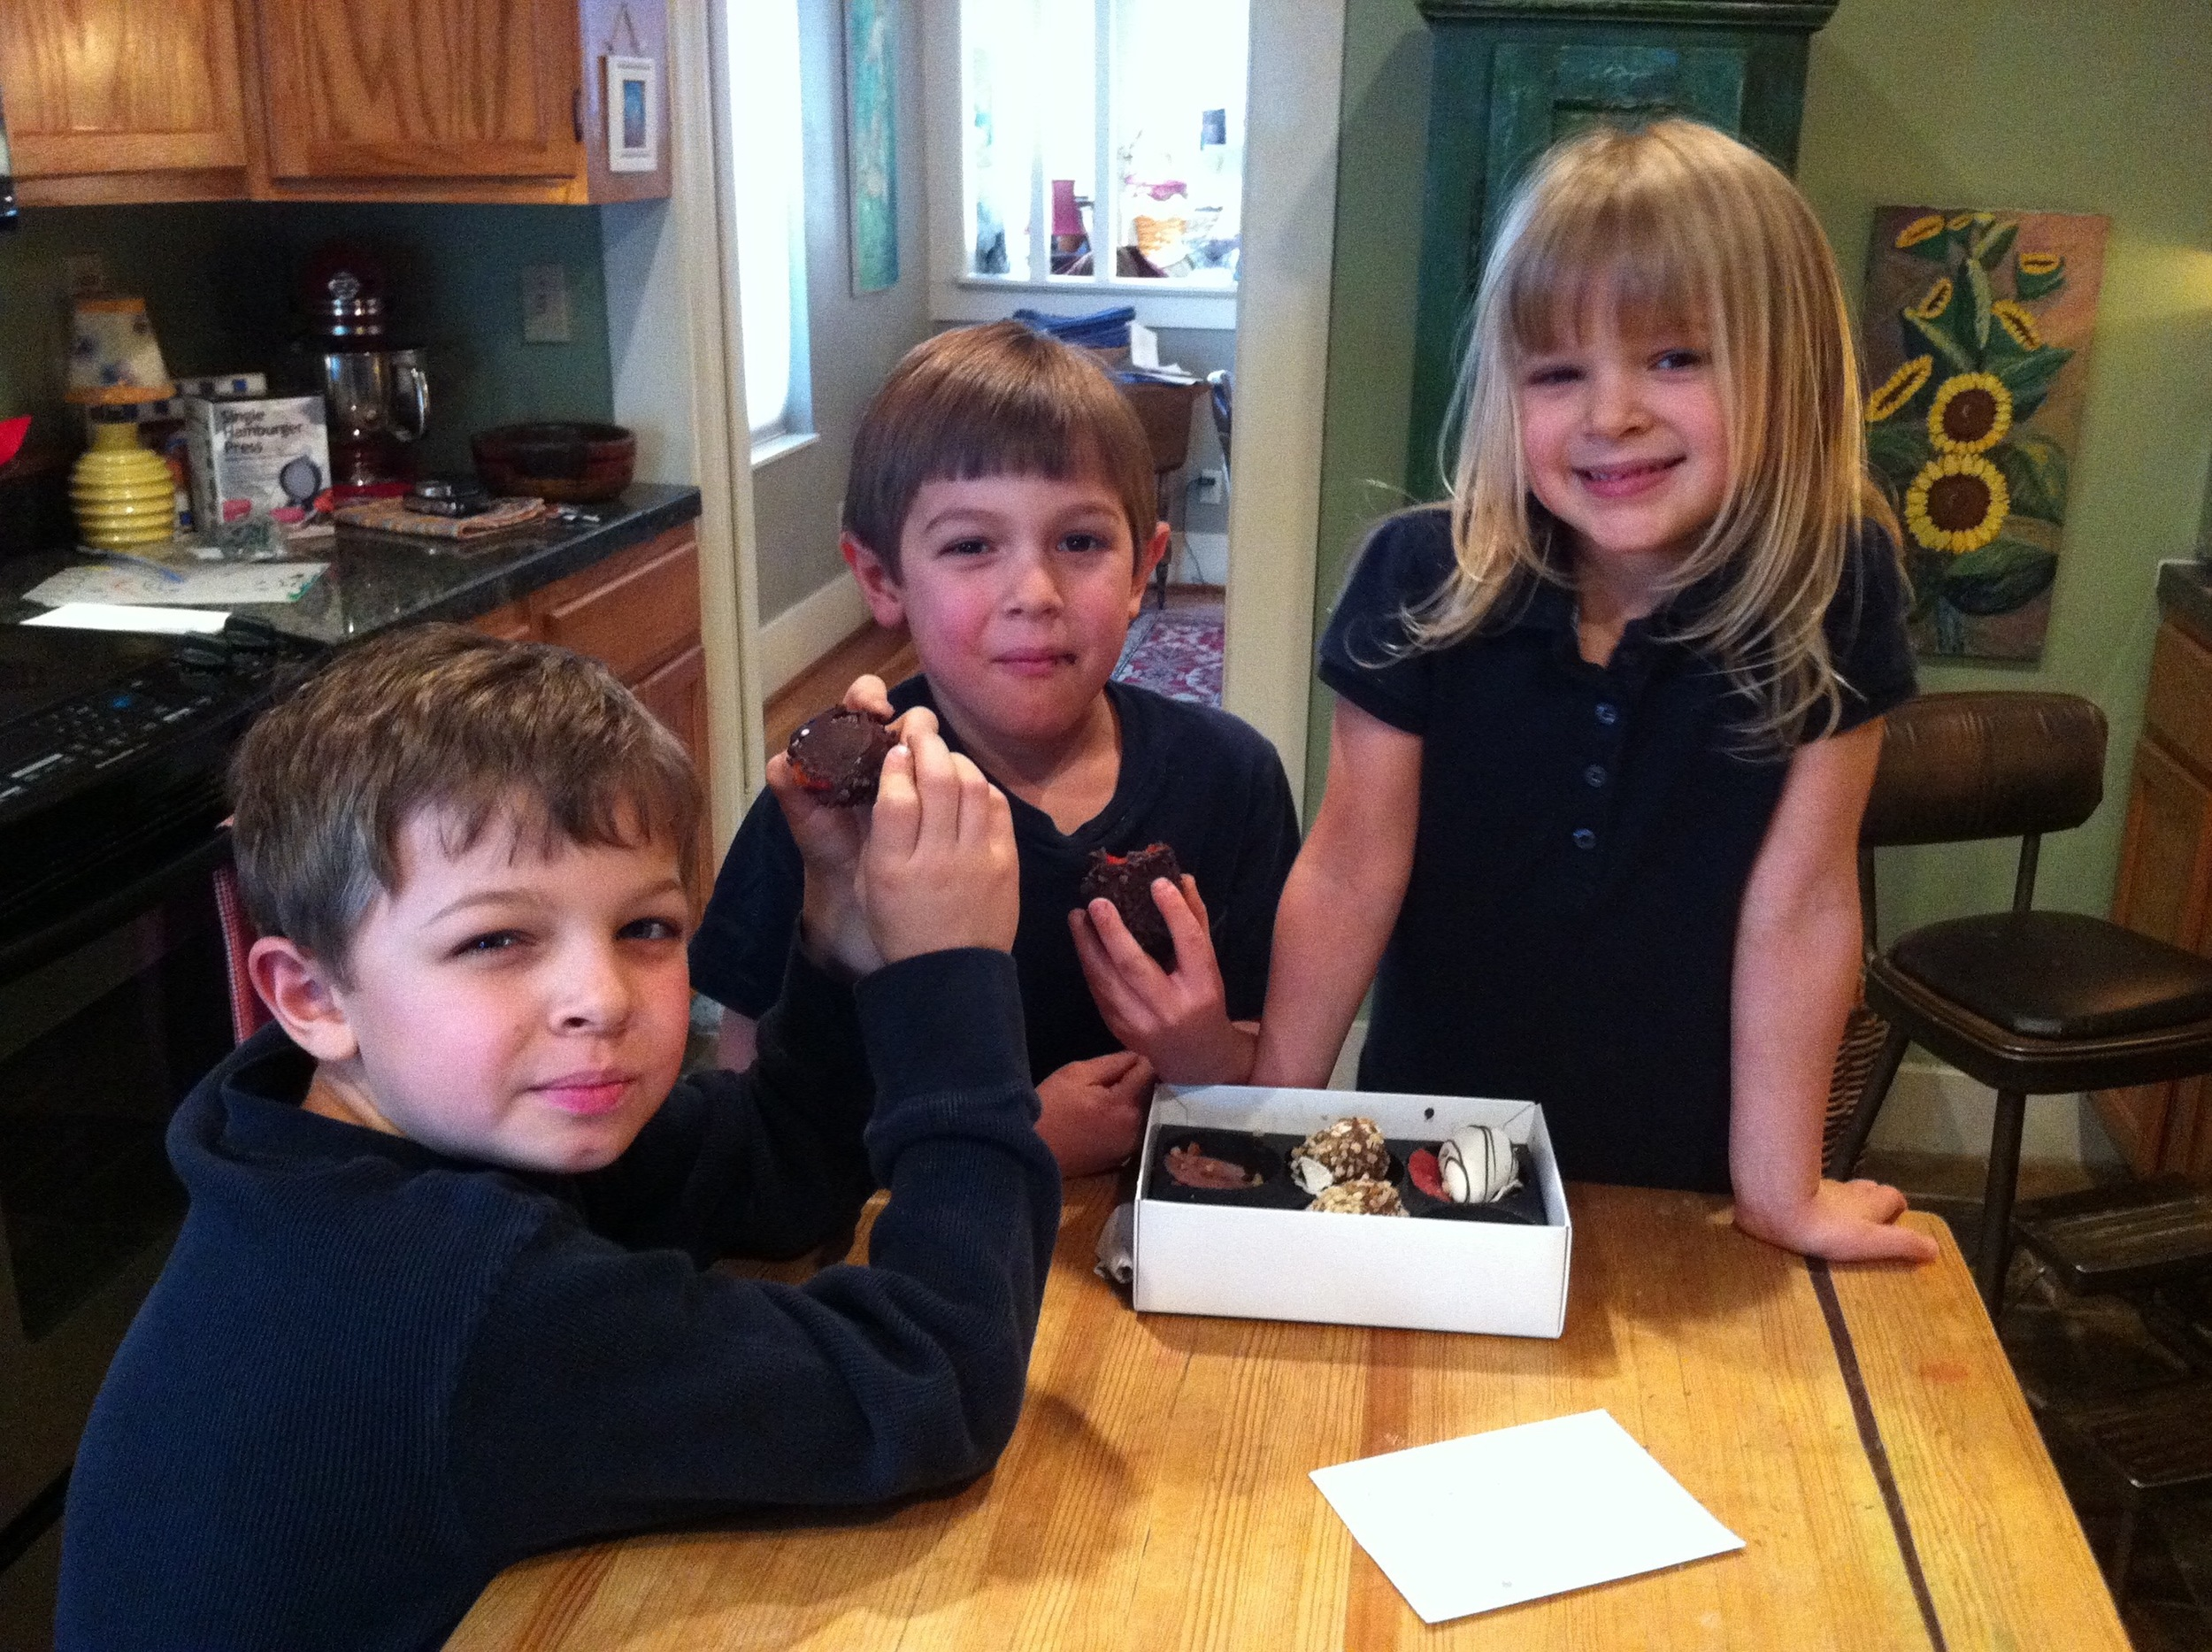 kids sharing treats